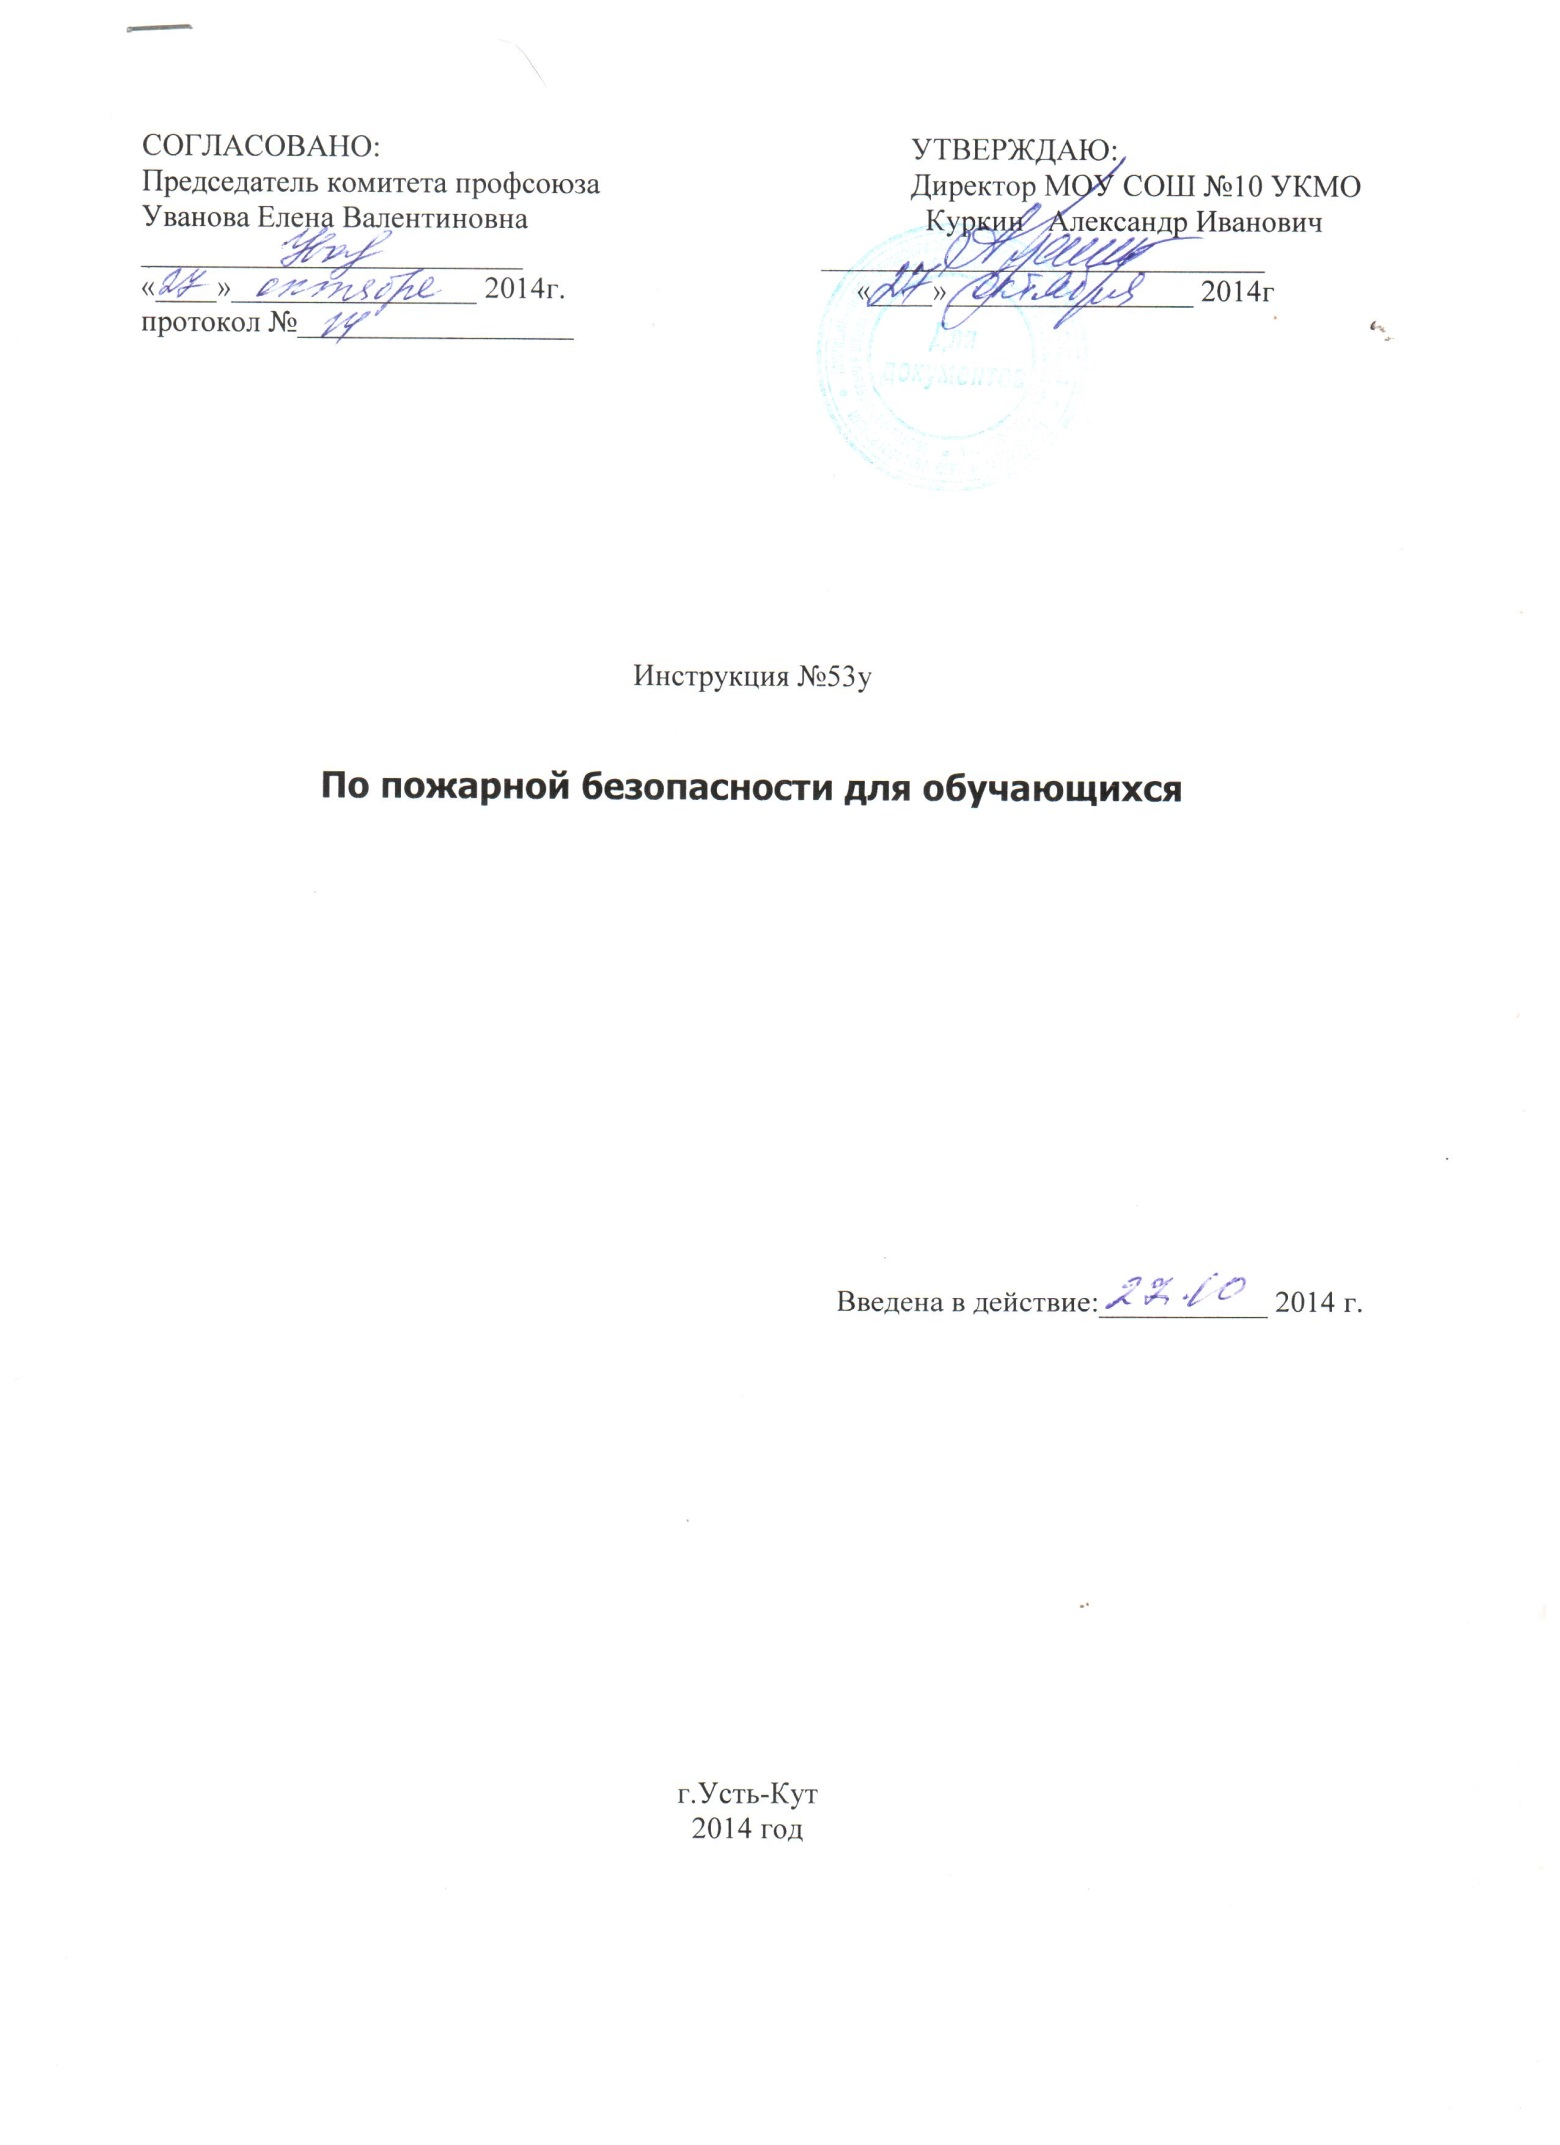 C:\Users\Admin\Documents\Scanned Documents\Рисунок (30).jpg